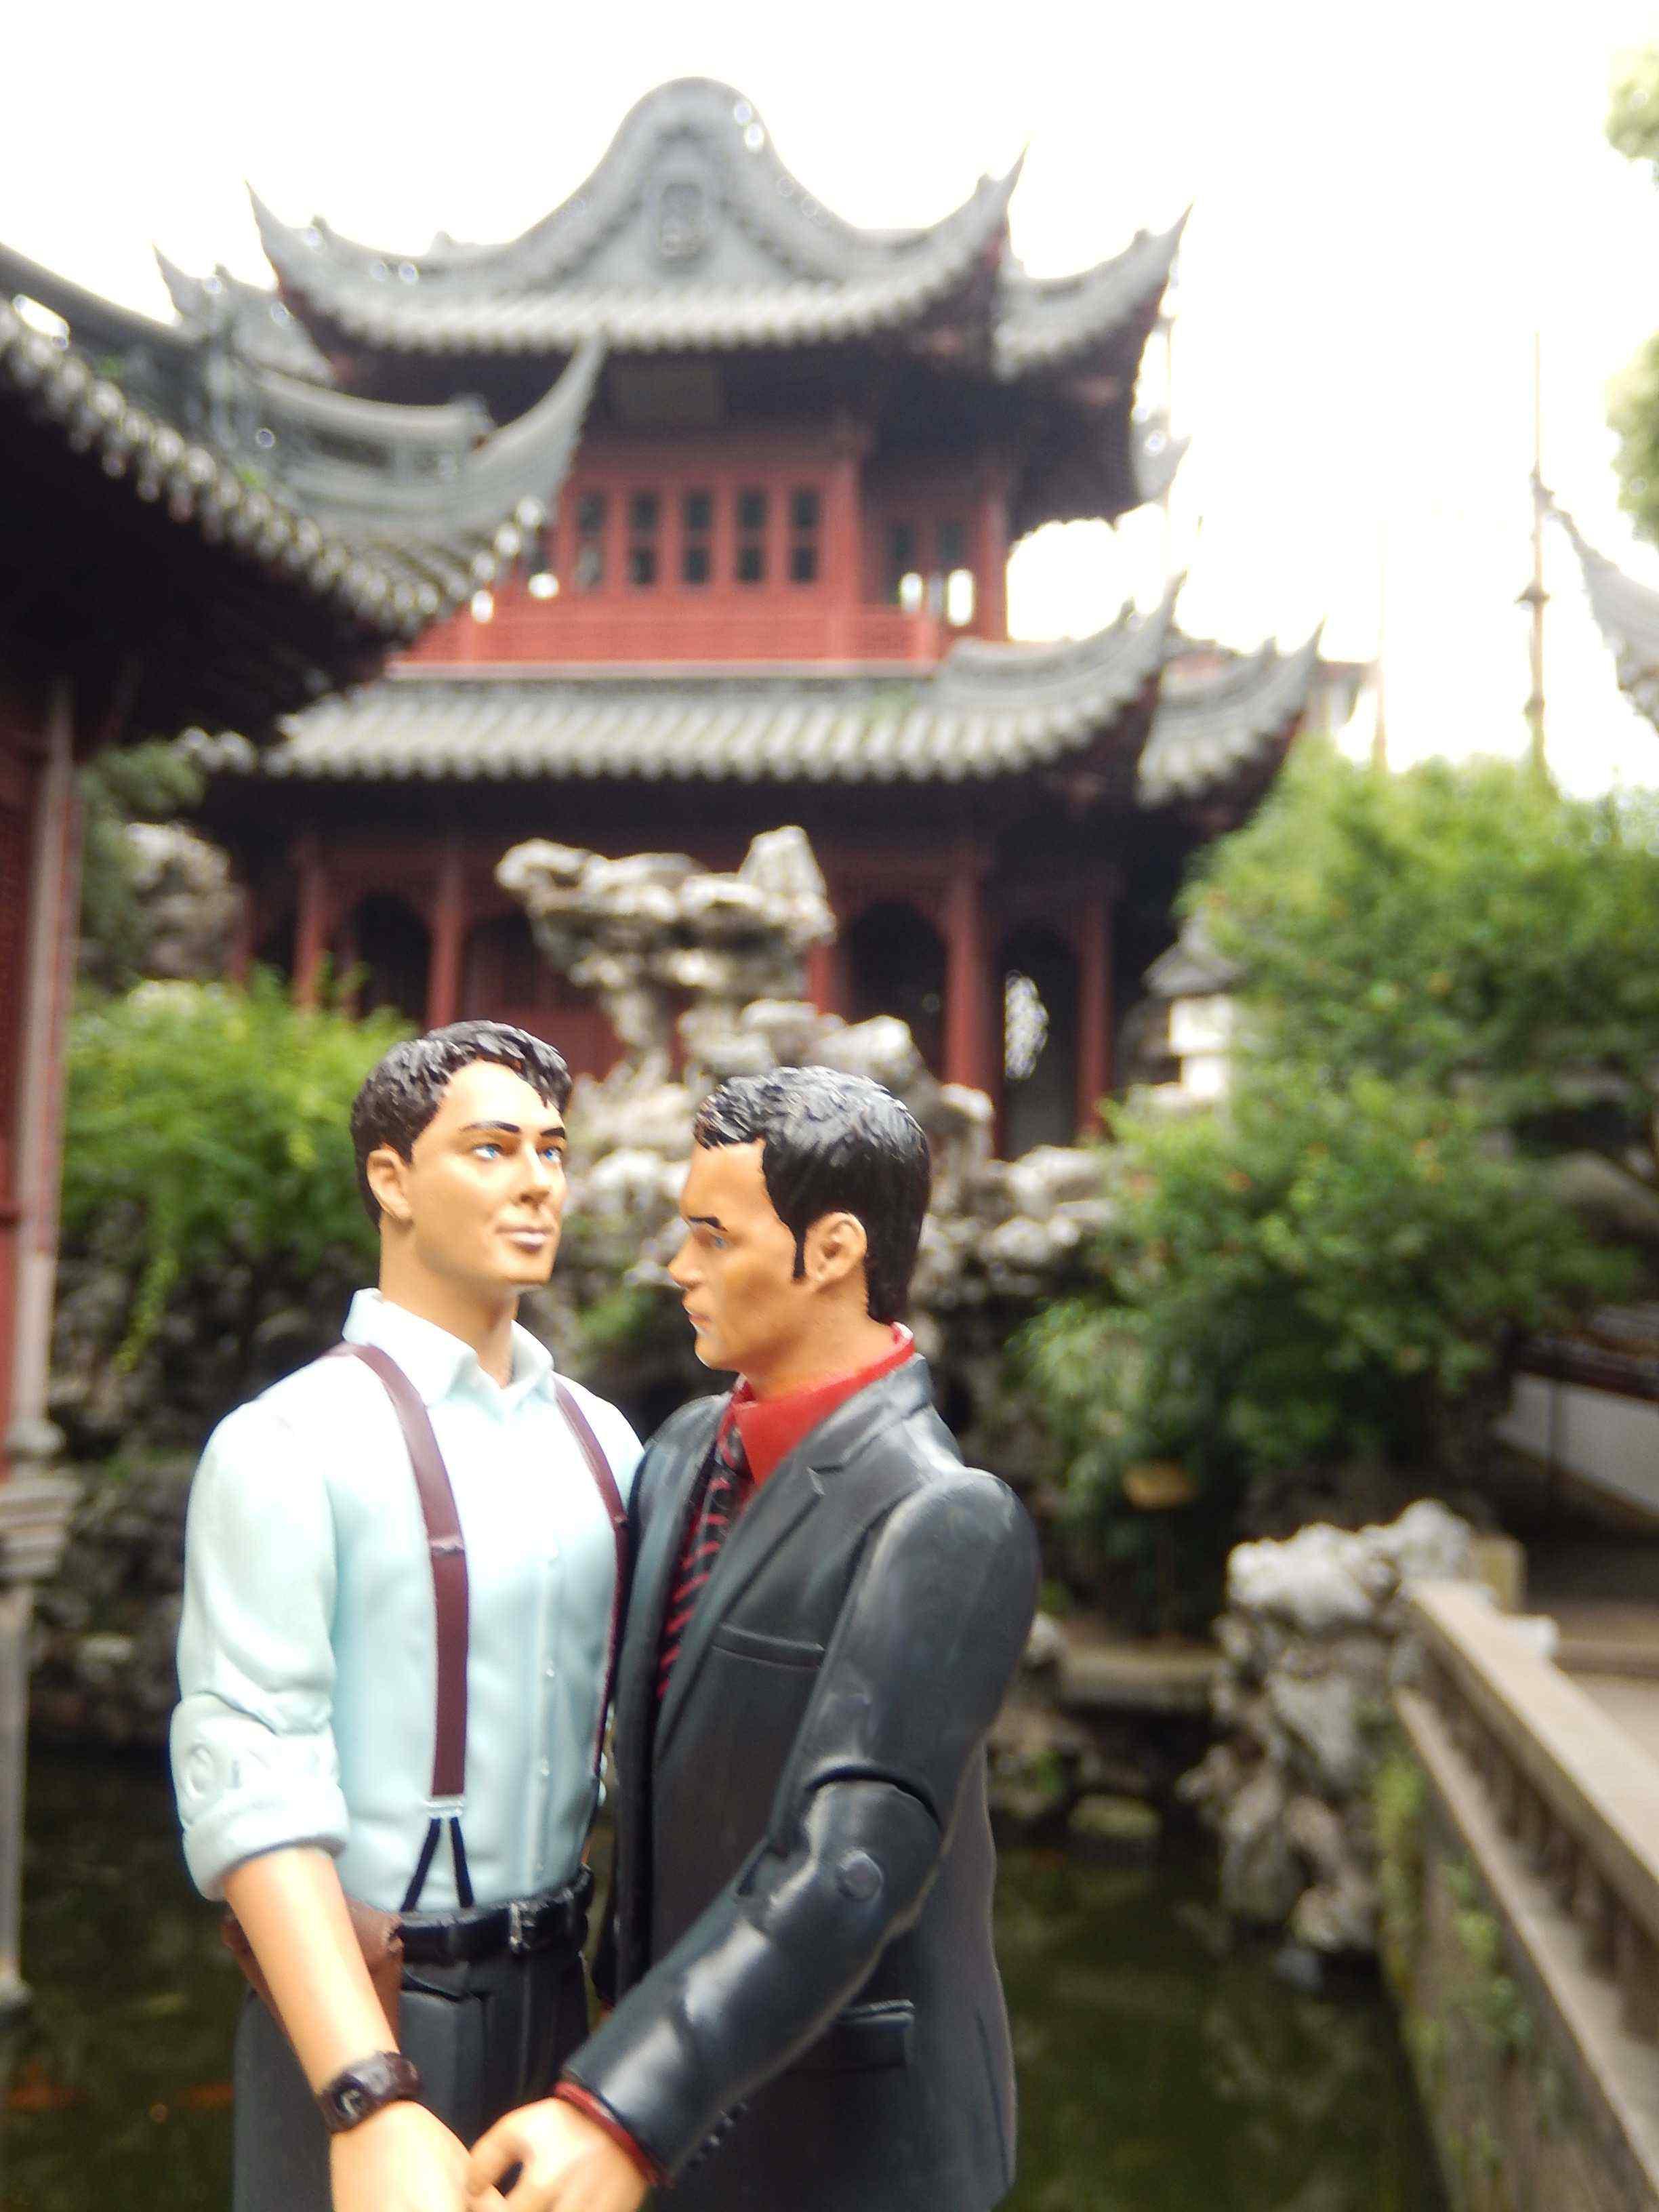 2013.06.19 - 07 - Shanghai Yu-Garten